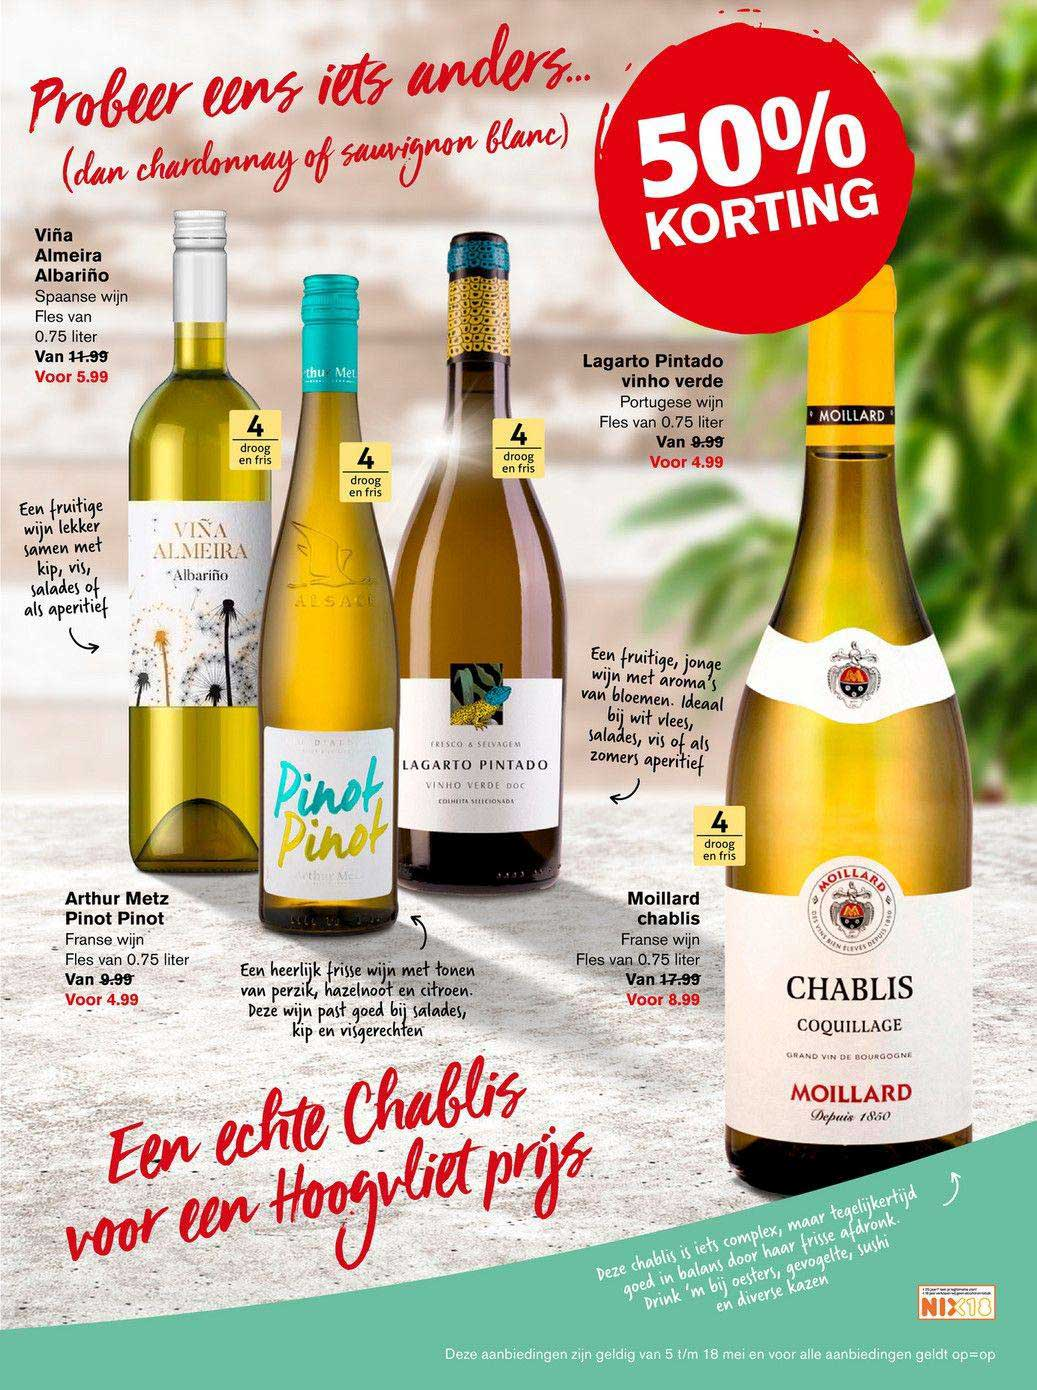 Hoogvliet Viña Almeira Albariño, Arthur Metz Pinot Pinot, Moillard Chablis Of Lagarto Pintado Vinho Verde 50% Korting